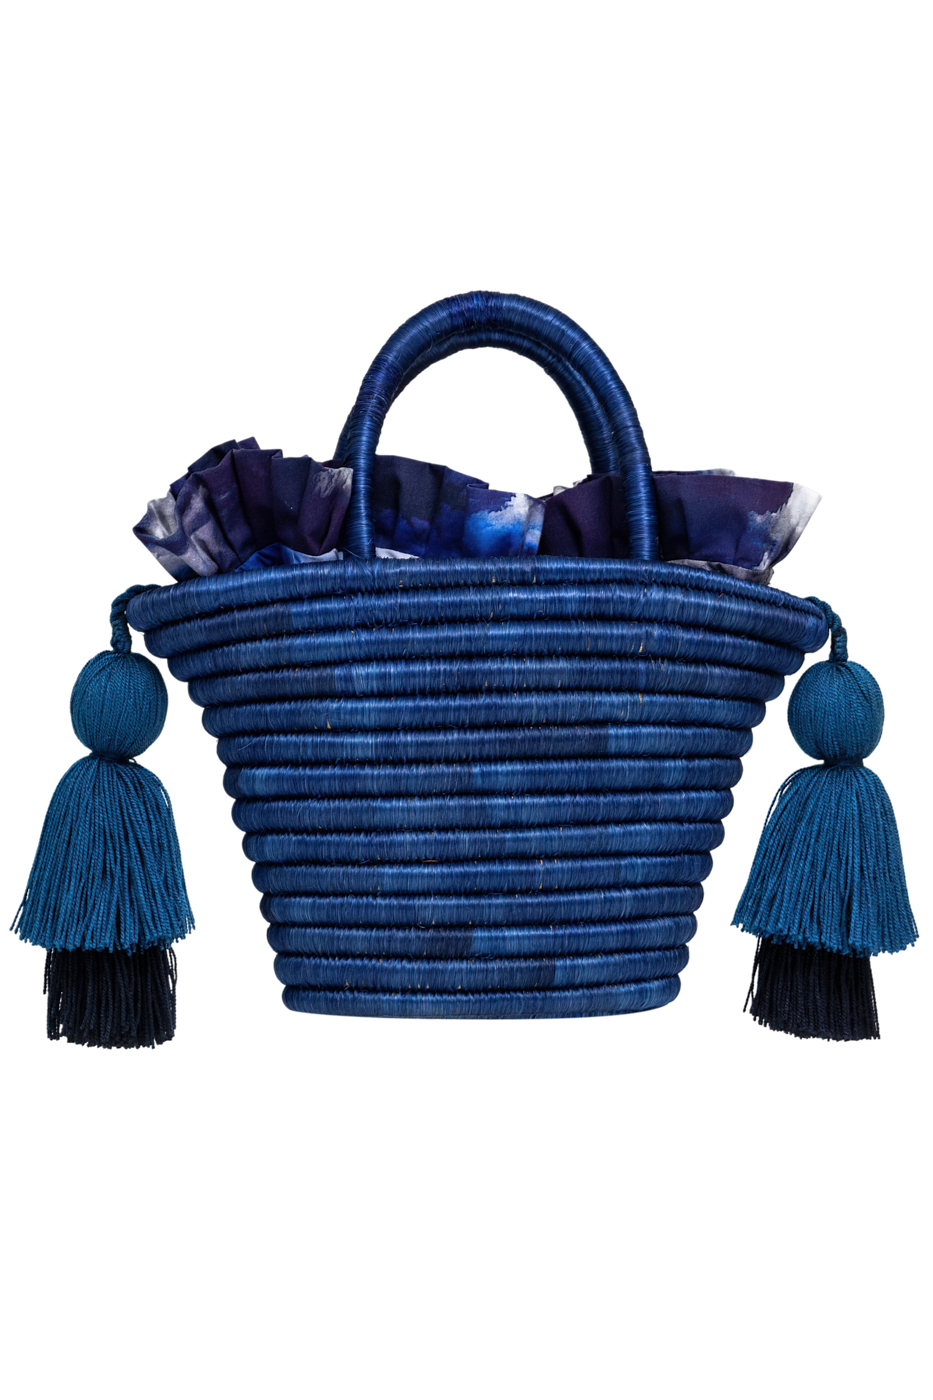 Bolsito Guacamayas- Azul rey